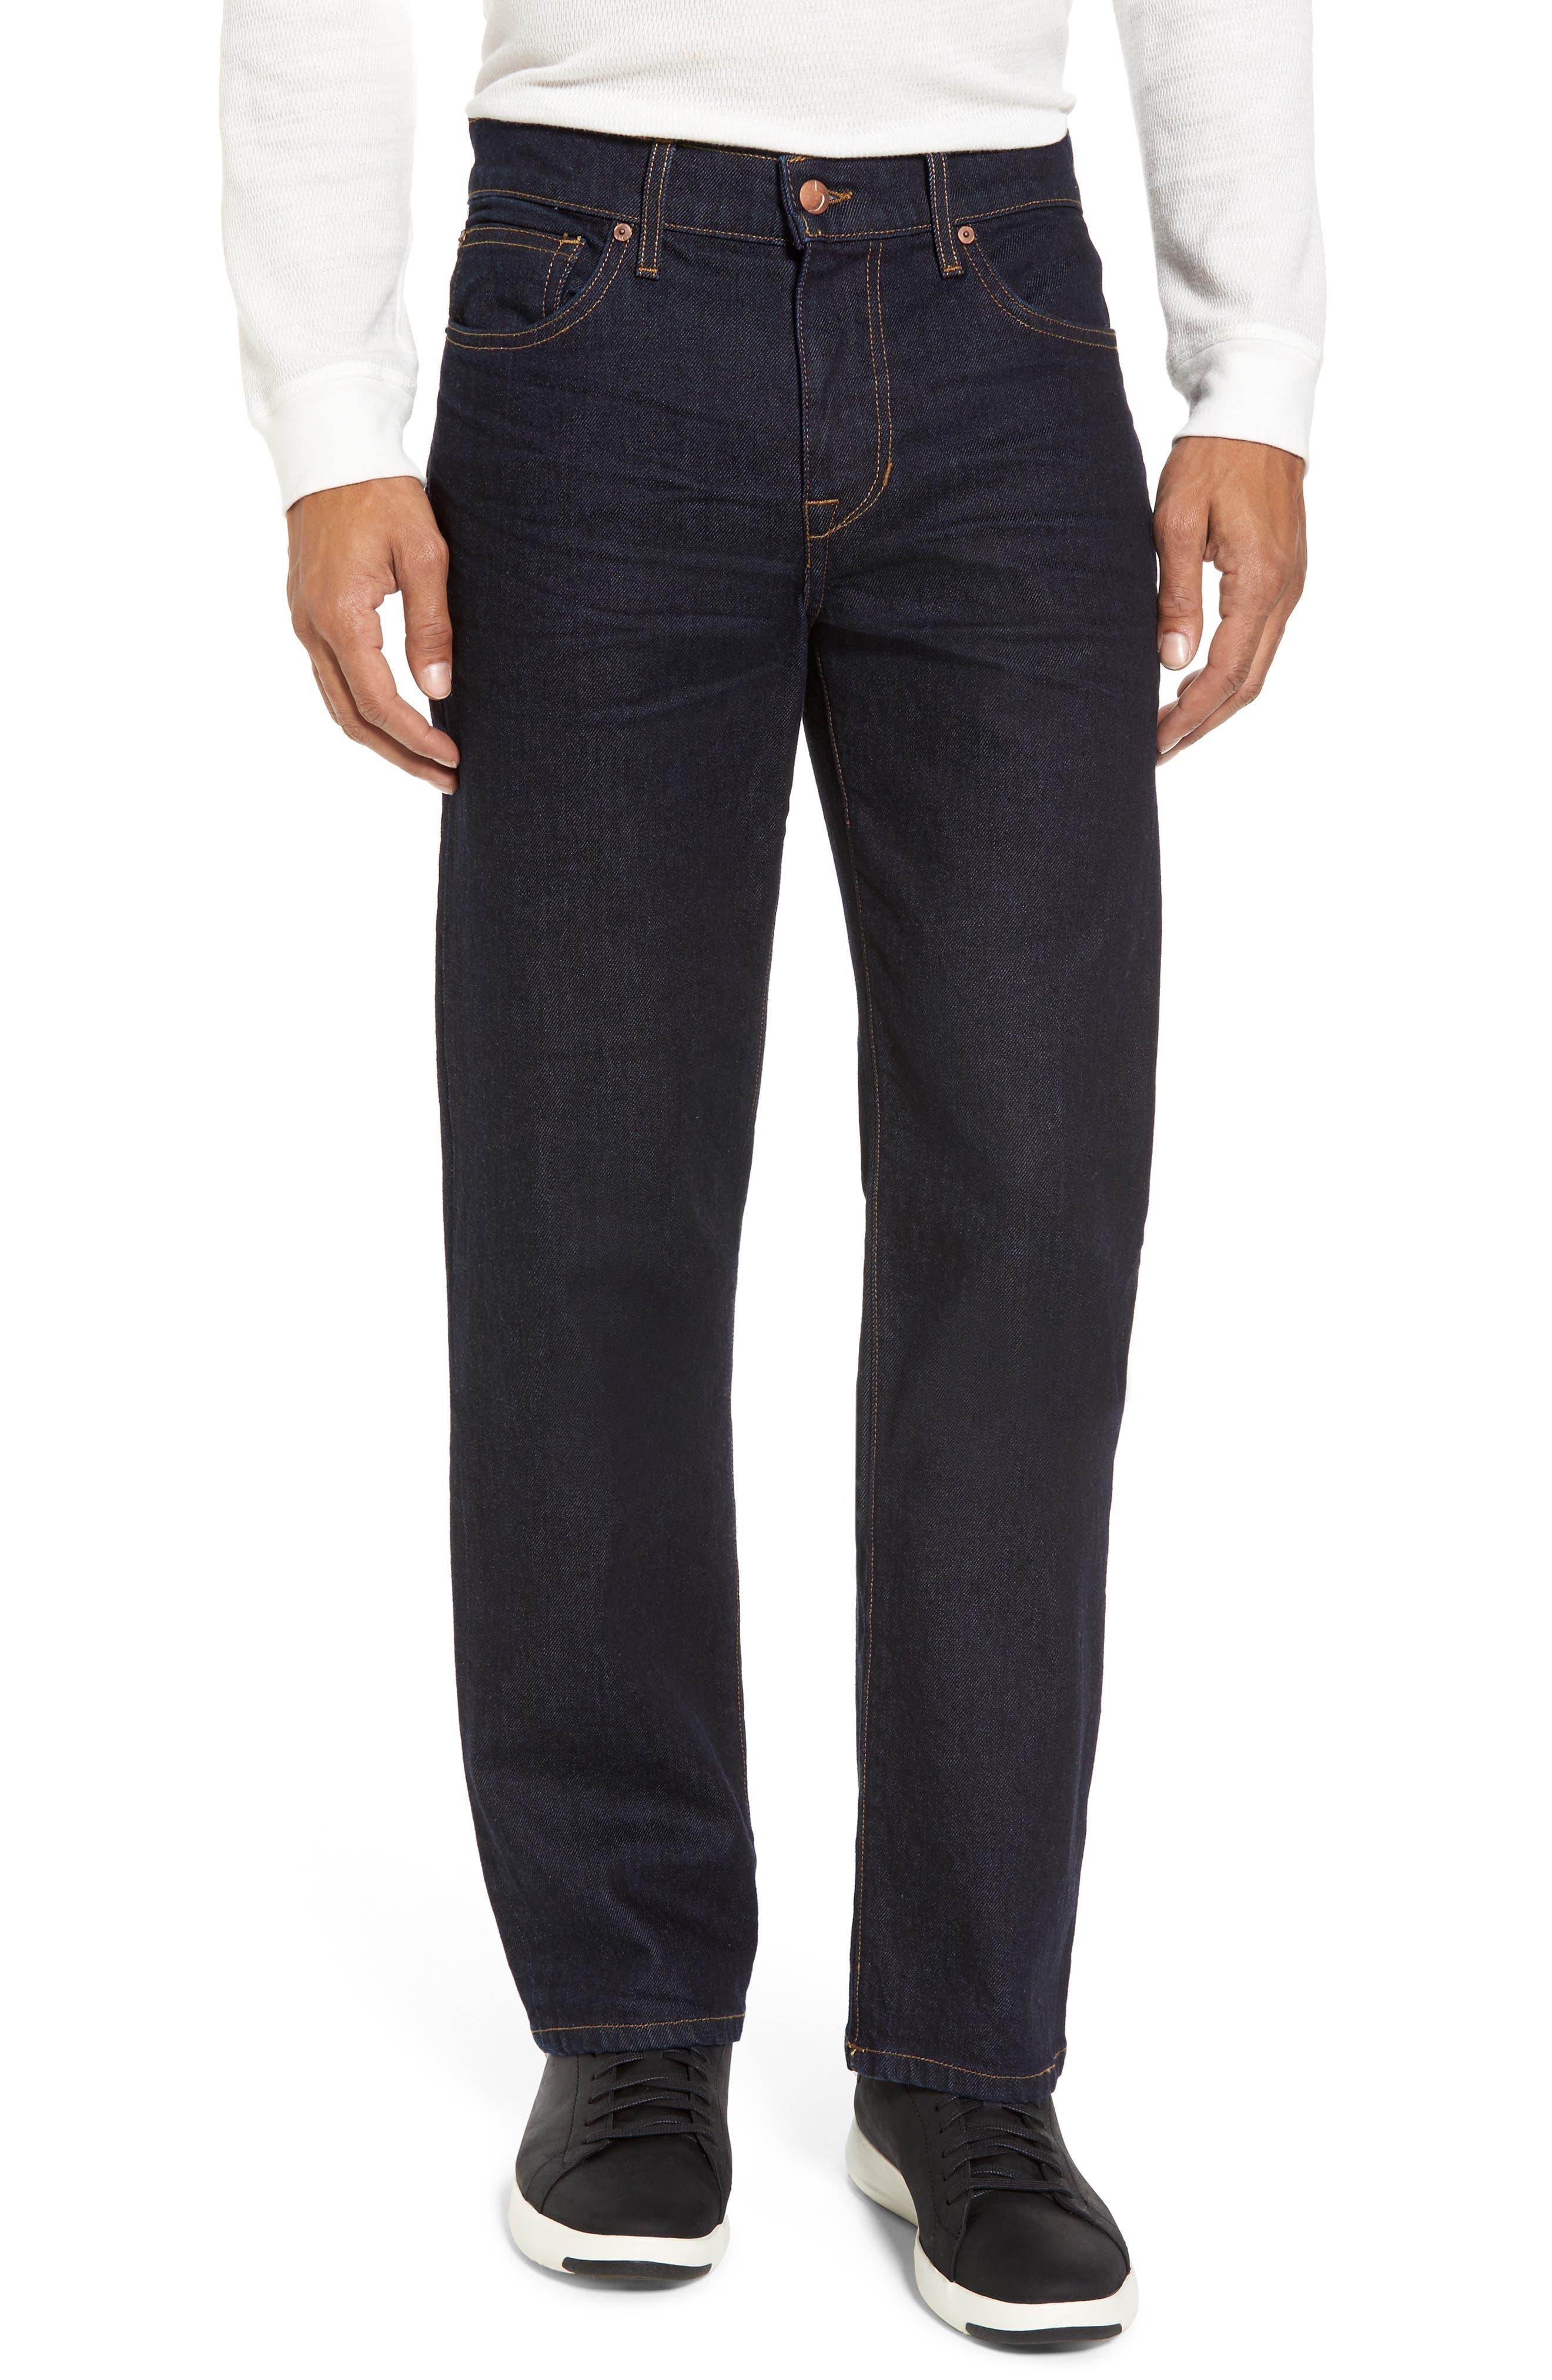 Brixton Slim Straight Leg Jeans,                             Main thumbnail 1, color,                             400